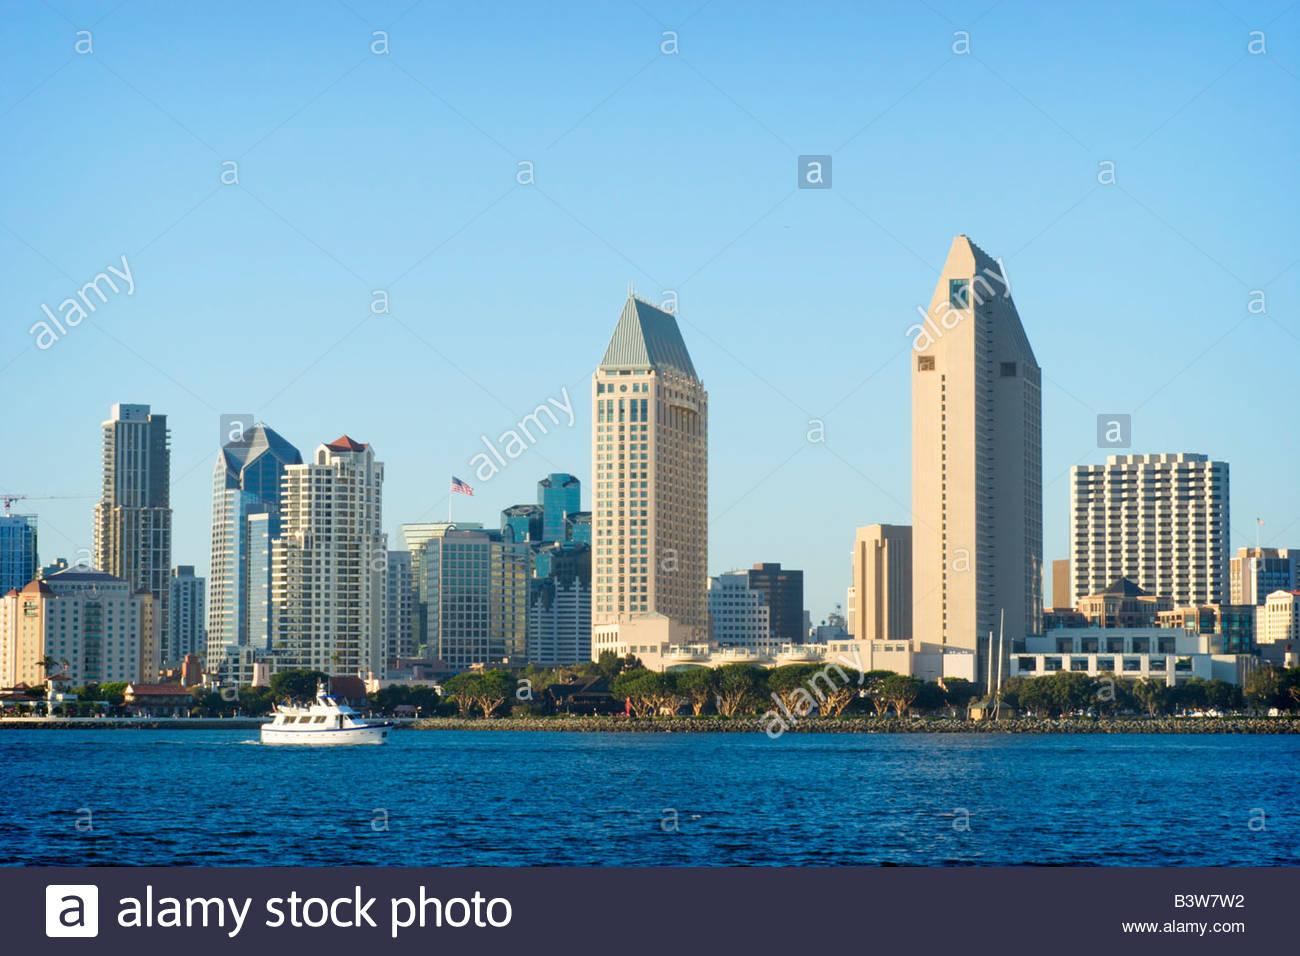 Downtown San Diego Skyscrapers Coronado Island California